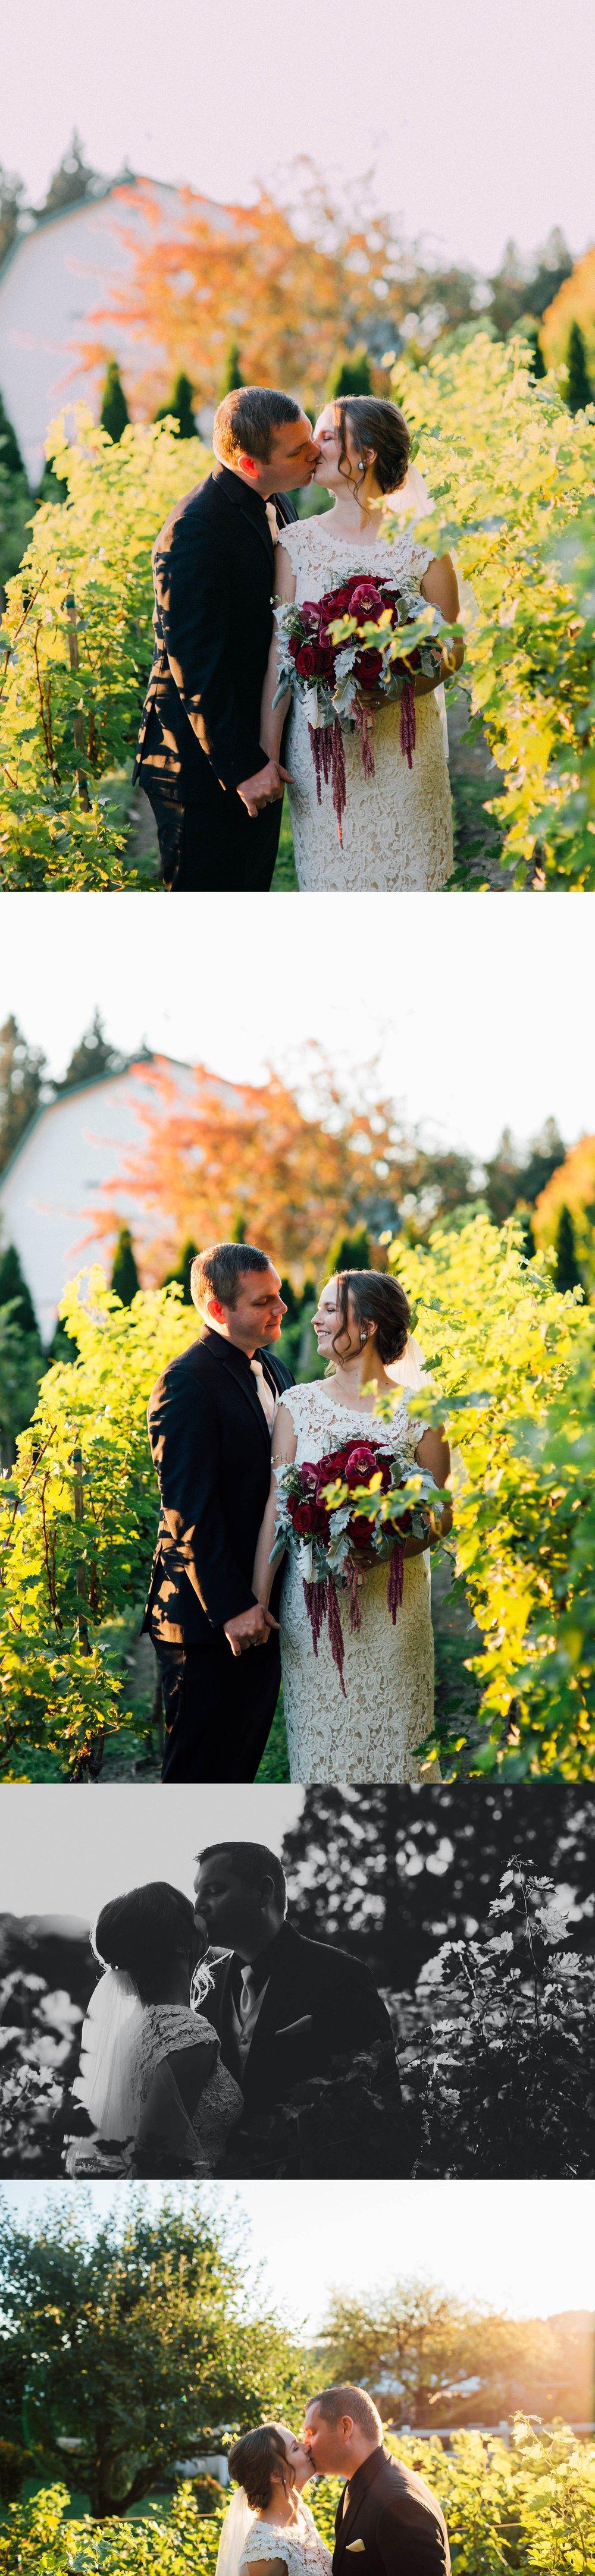 ashley_vos_seattle_ wedding_photographer_0195.jpg